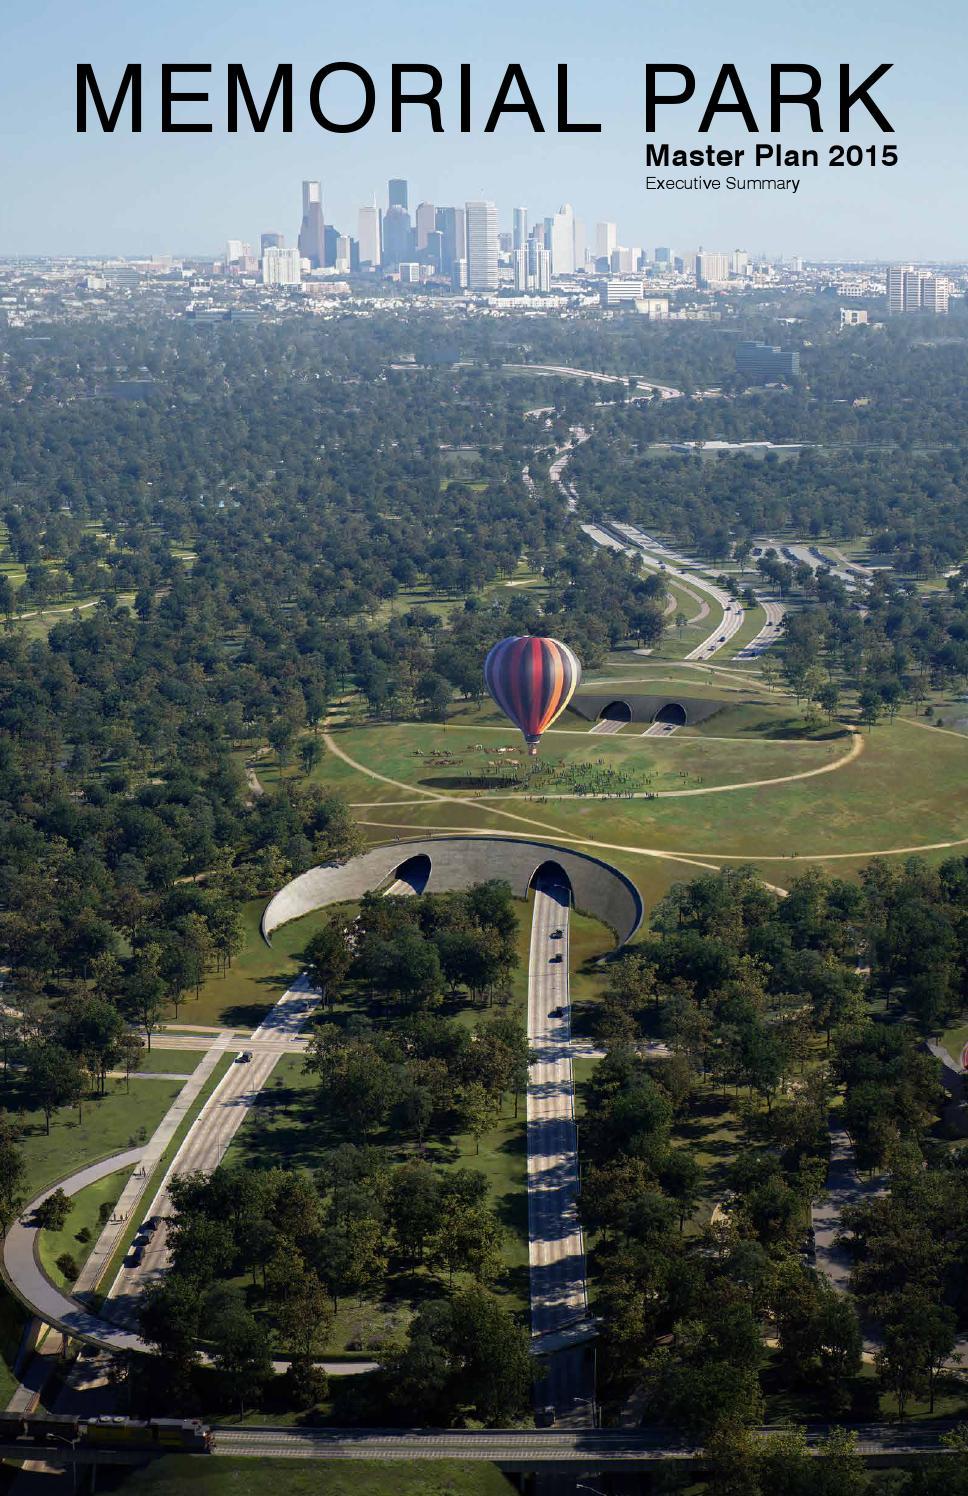 Memorial Park - Master Plan 2015